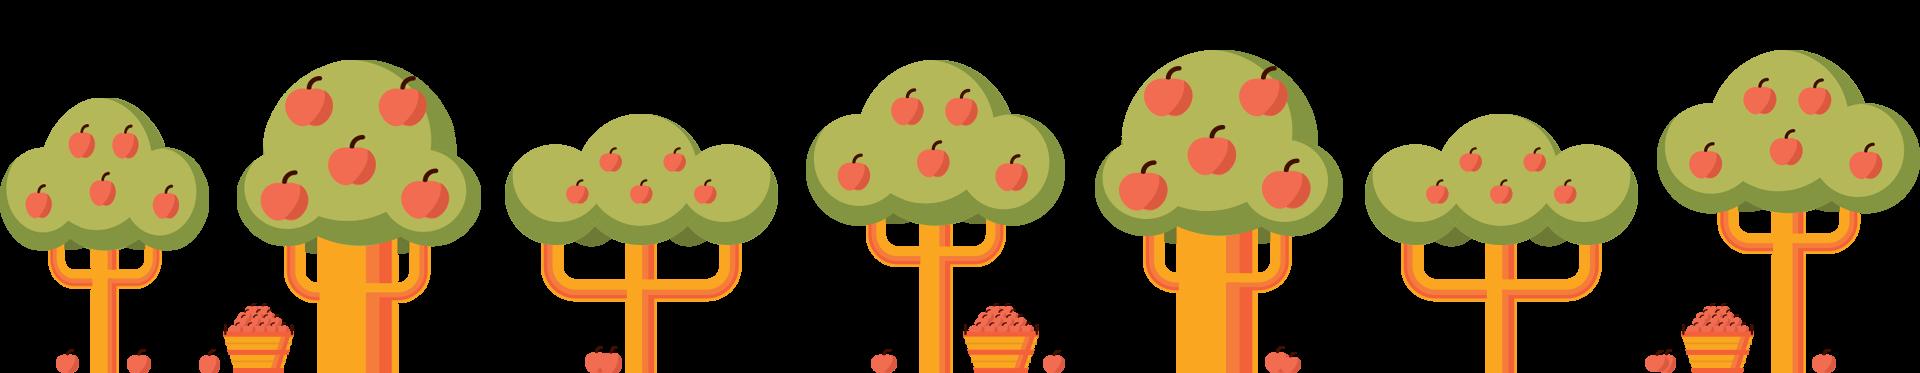 monetization APPLES trees4